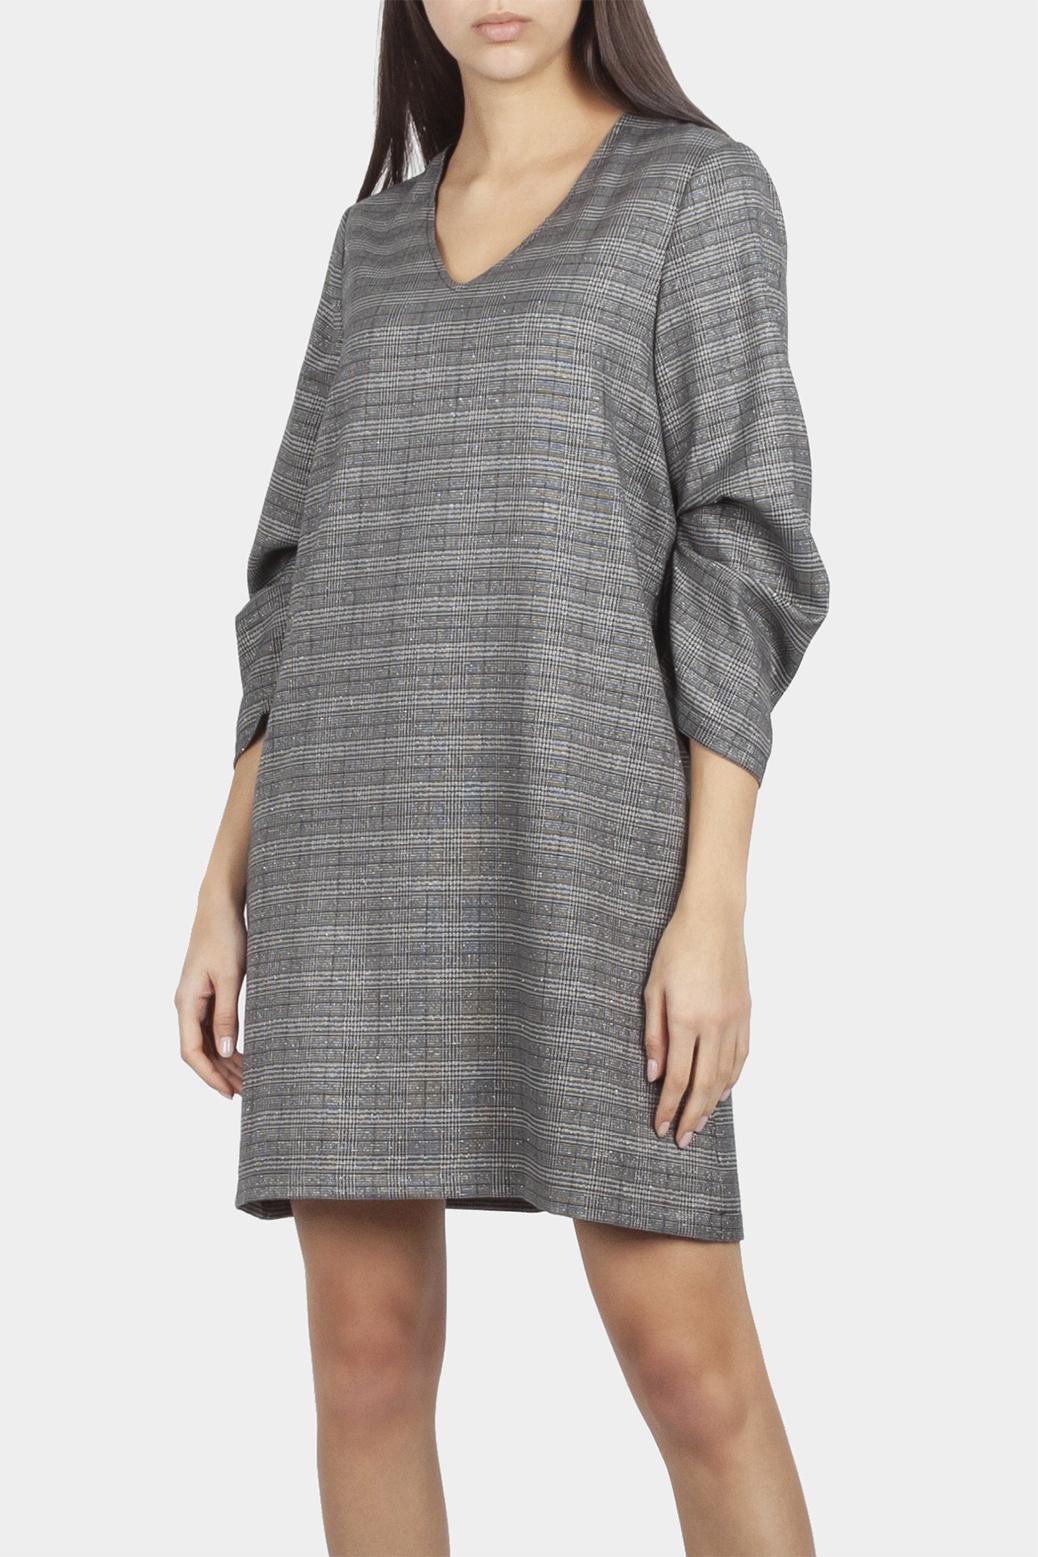 Frabric dress